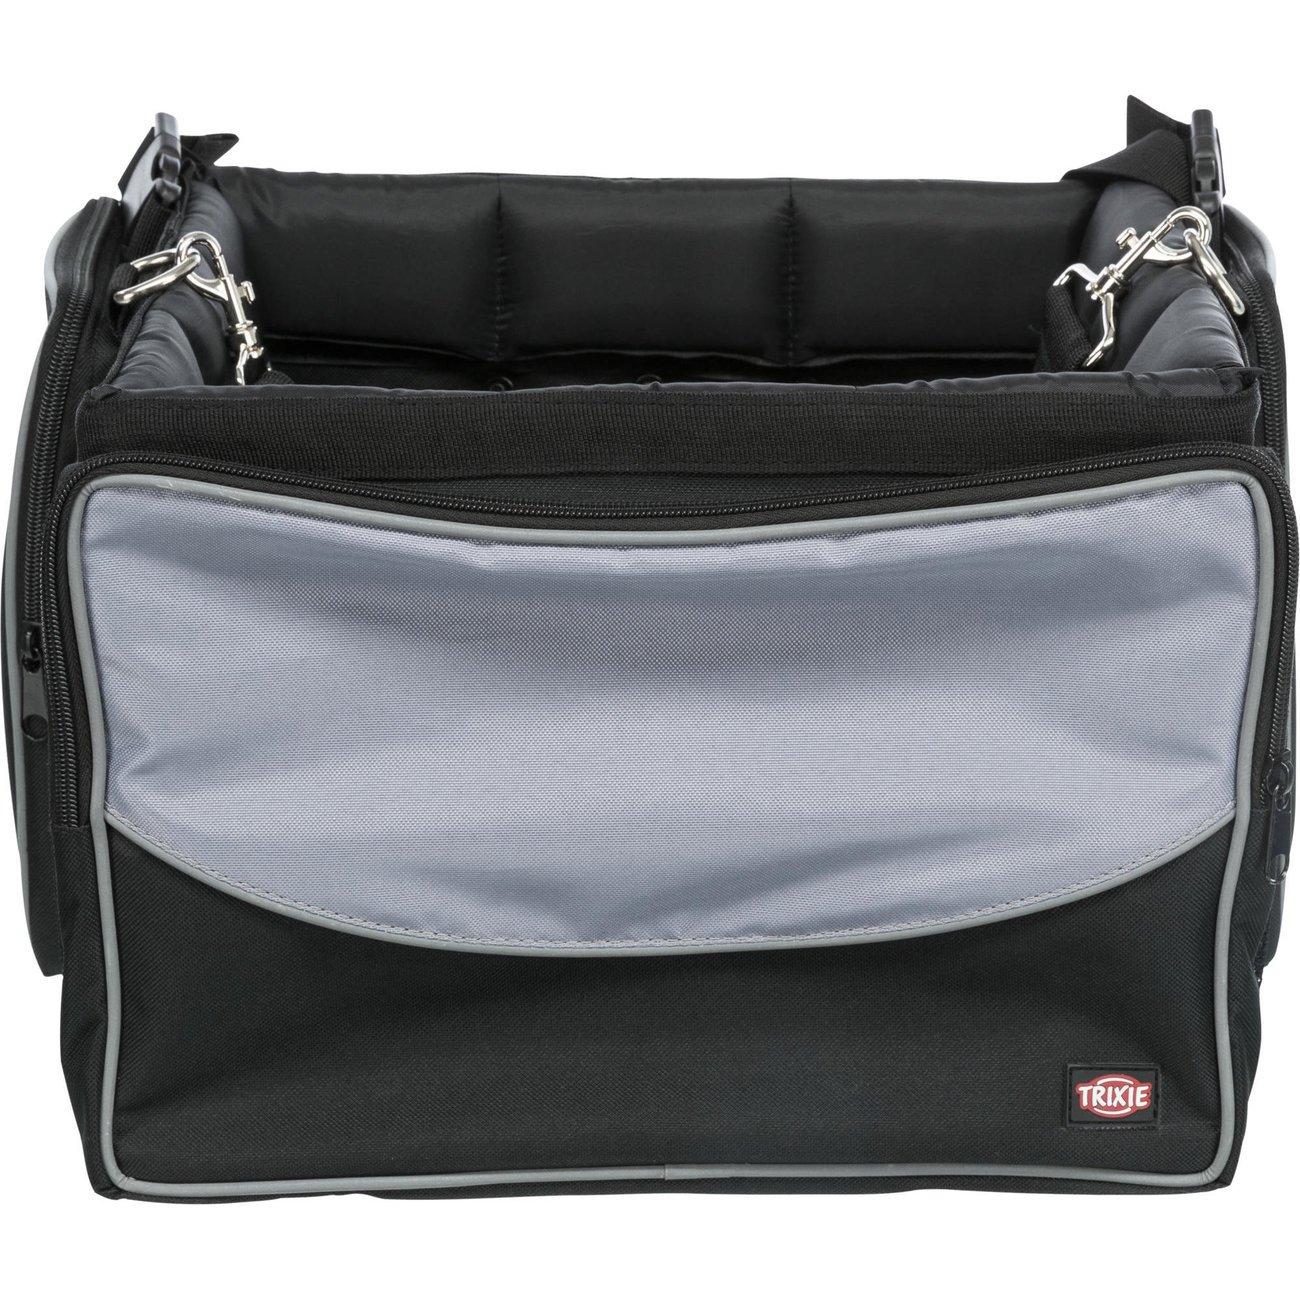 Trixie Front-Box Fahrradtasche, 41 × 26 × 26 cm, schwarz/grau